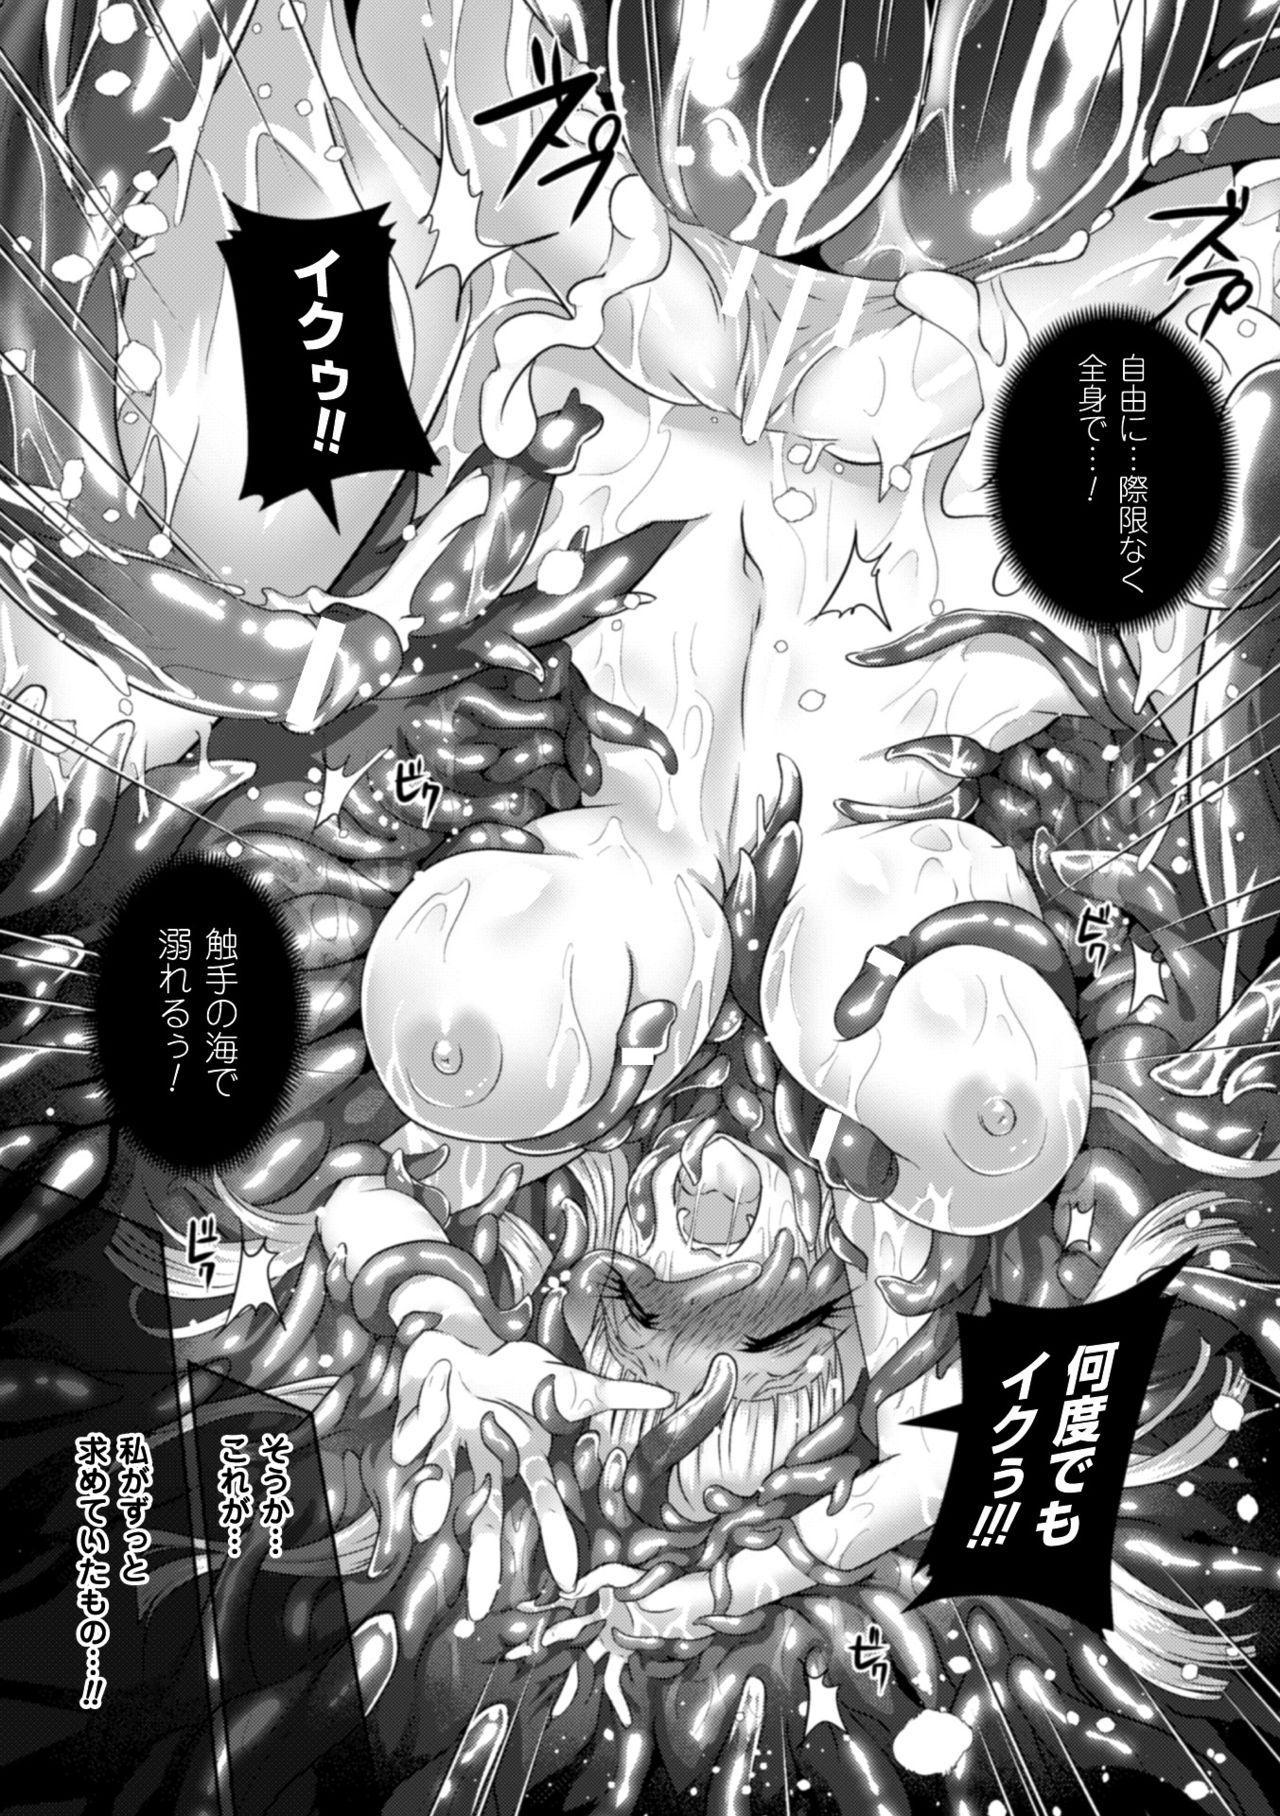 2D Comic Magazine Shokushu Yoroi ni Zenshin o Okasare Mugen Zecchou! Vol. 5 22